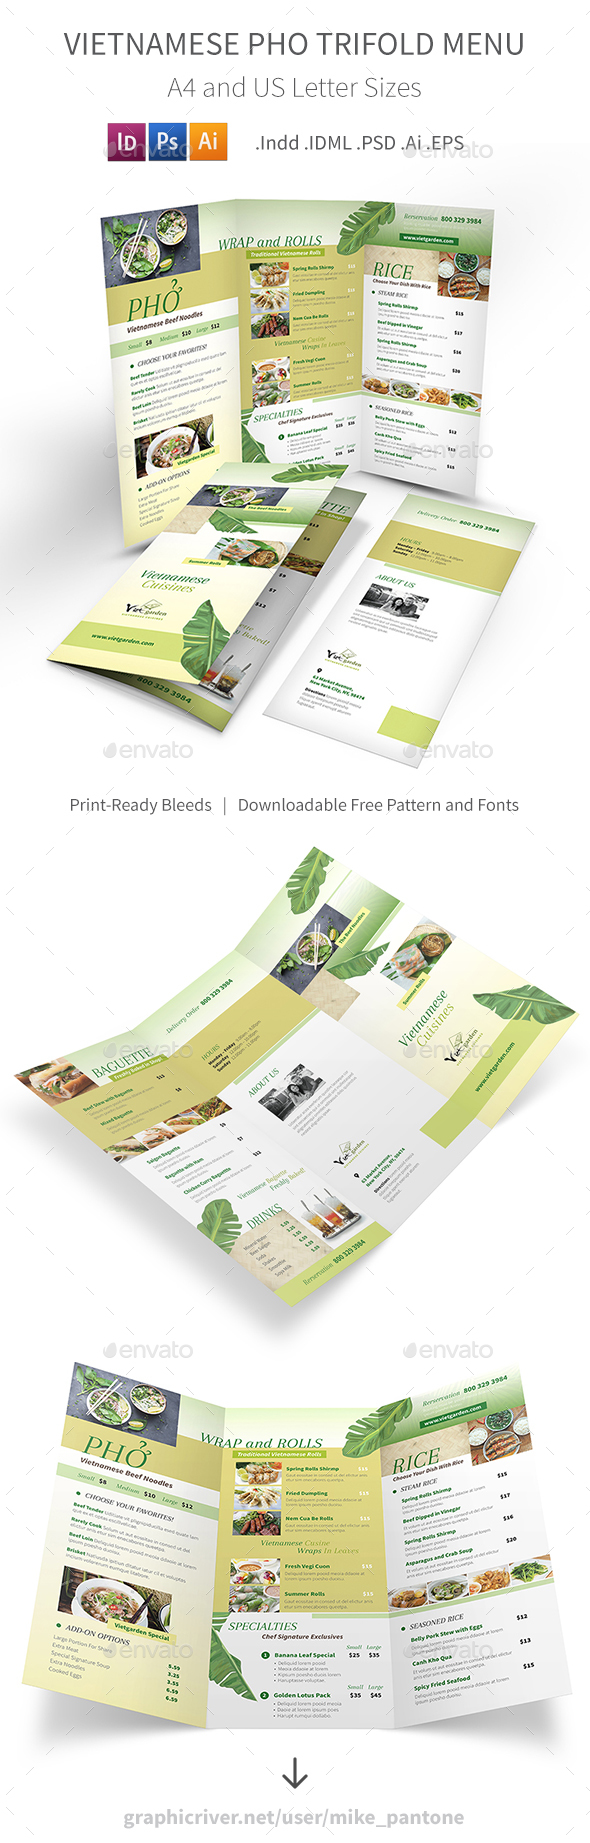 Vietnamese Pho Trifold Menu 3 - Food Menus Print Templates